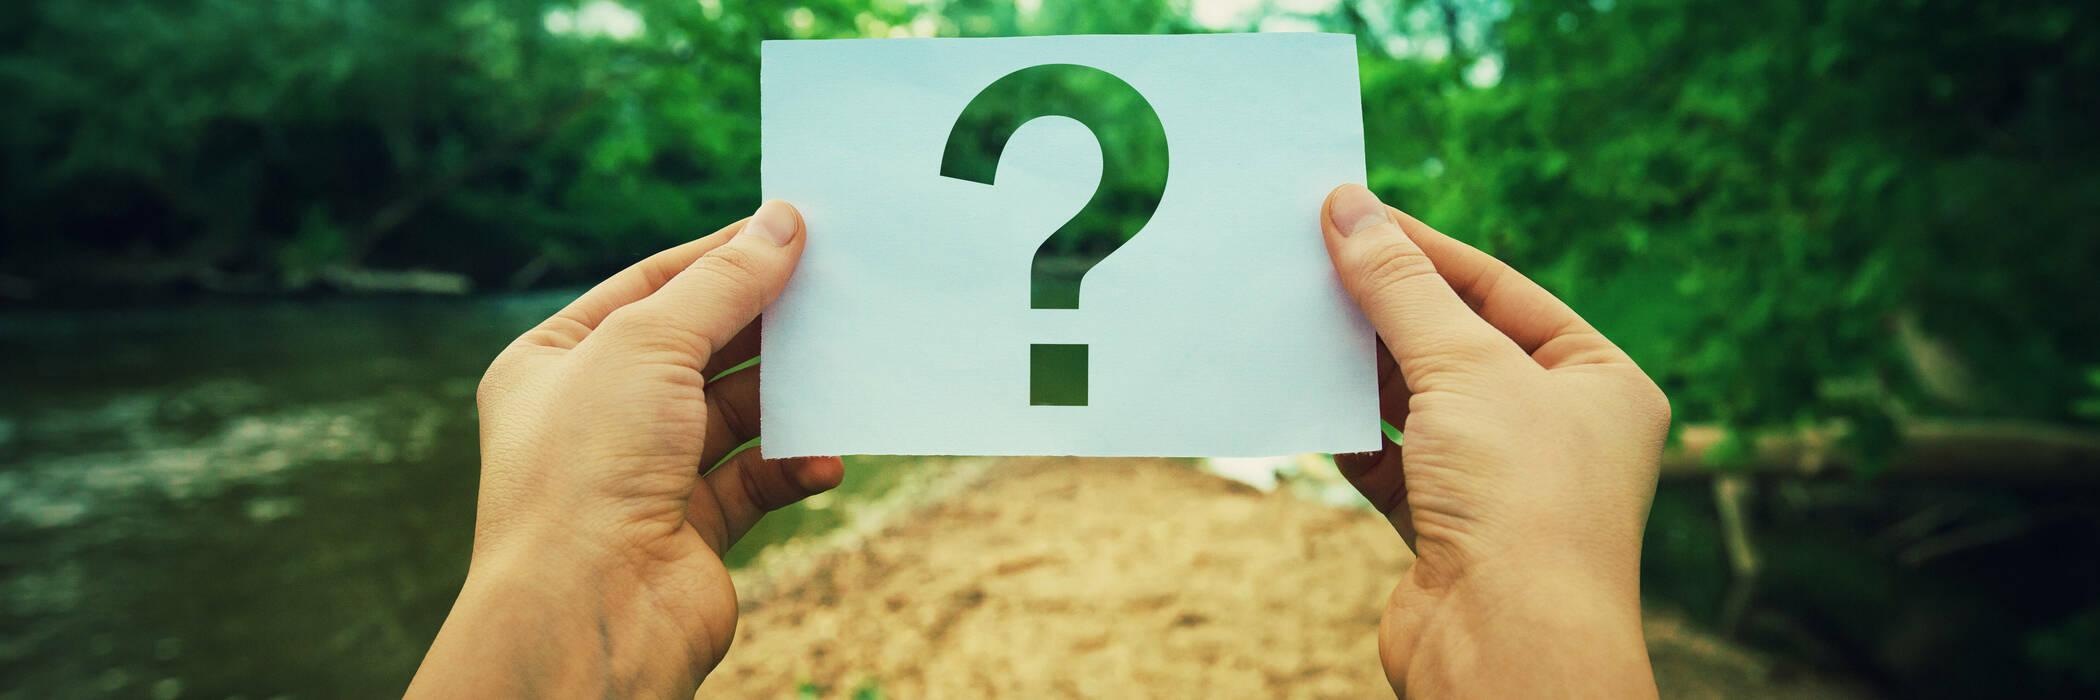 Question mark over environmental landscape